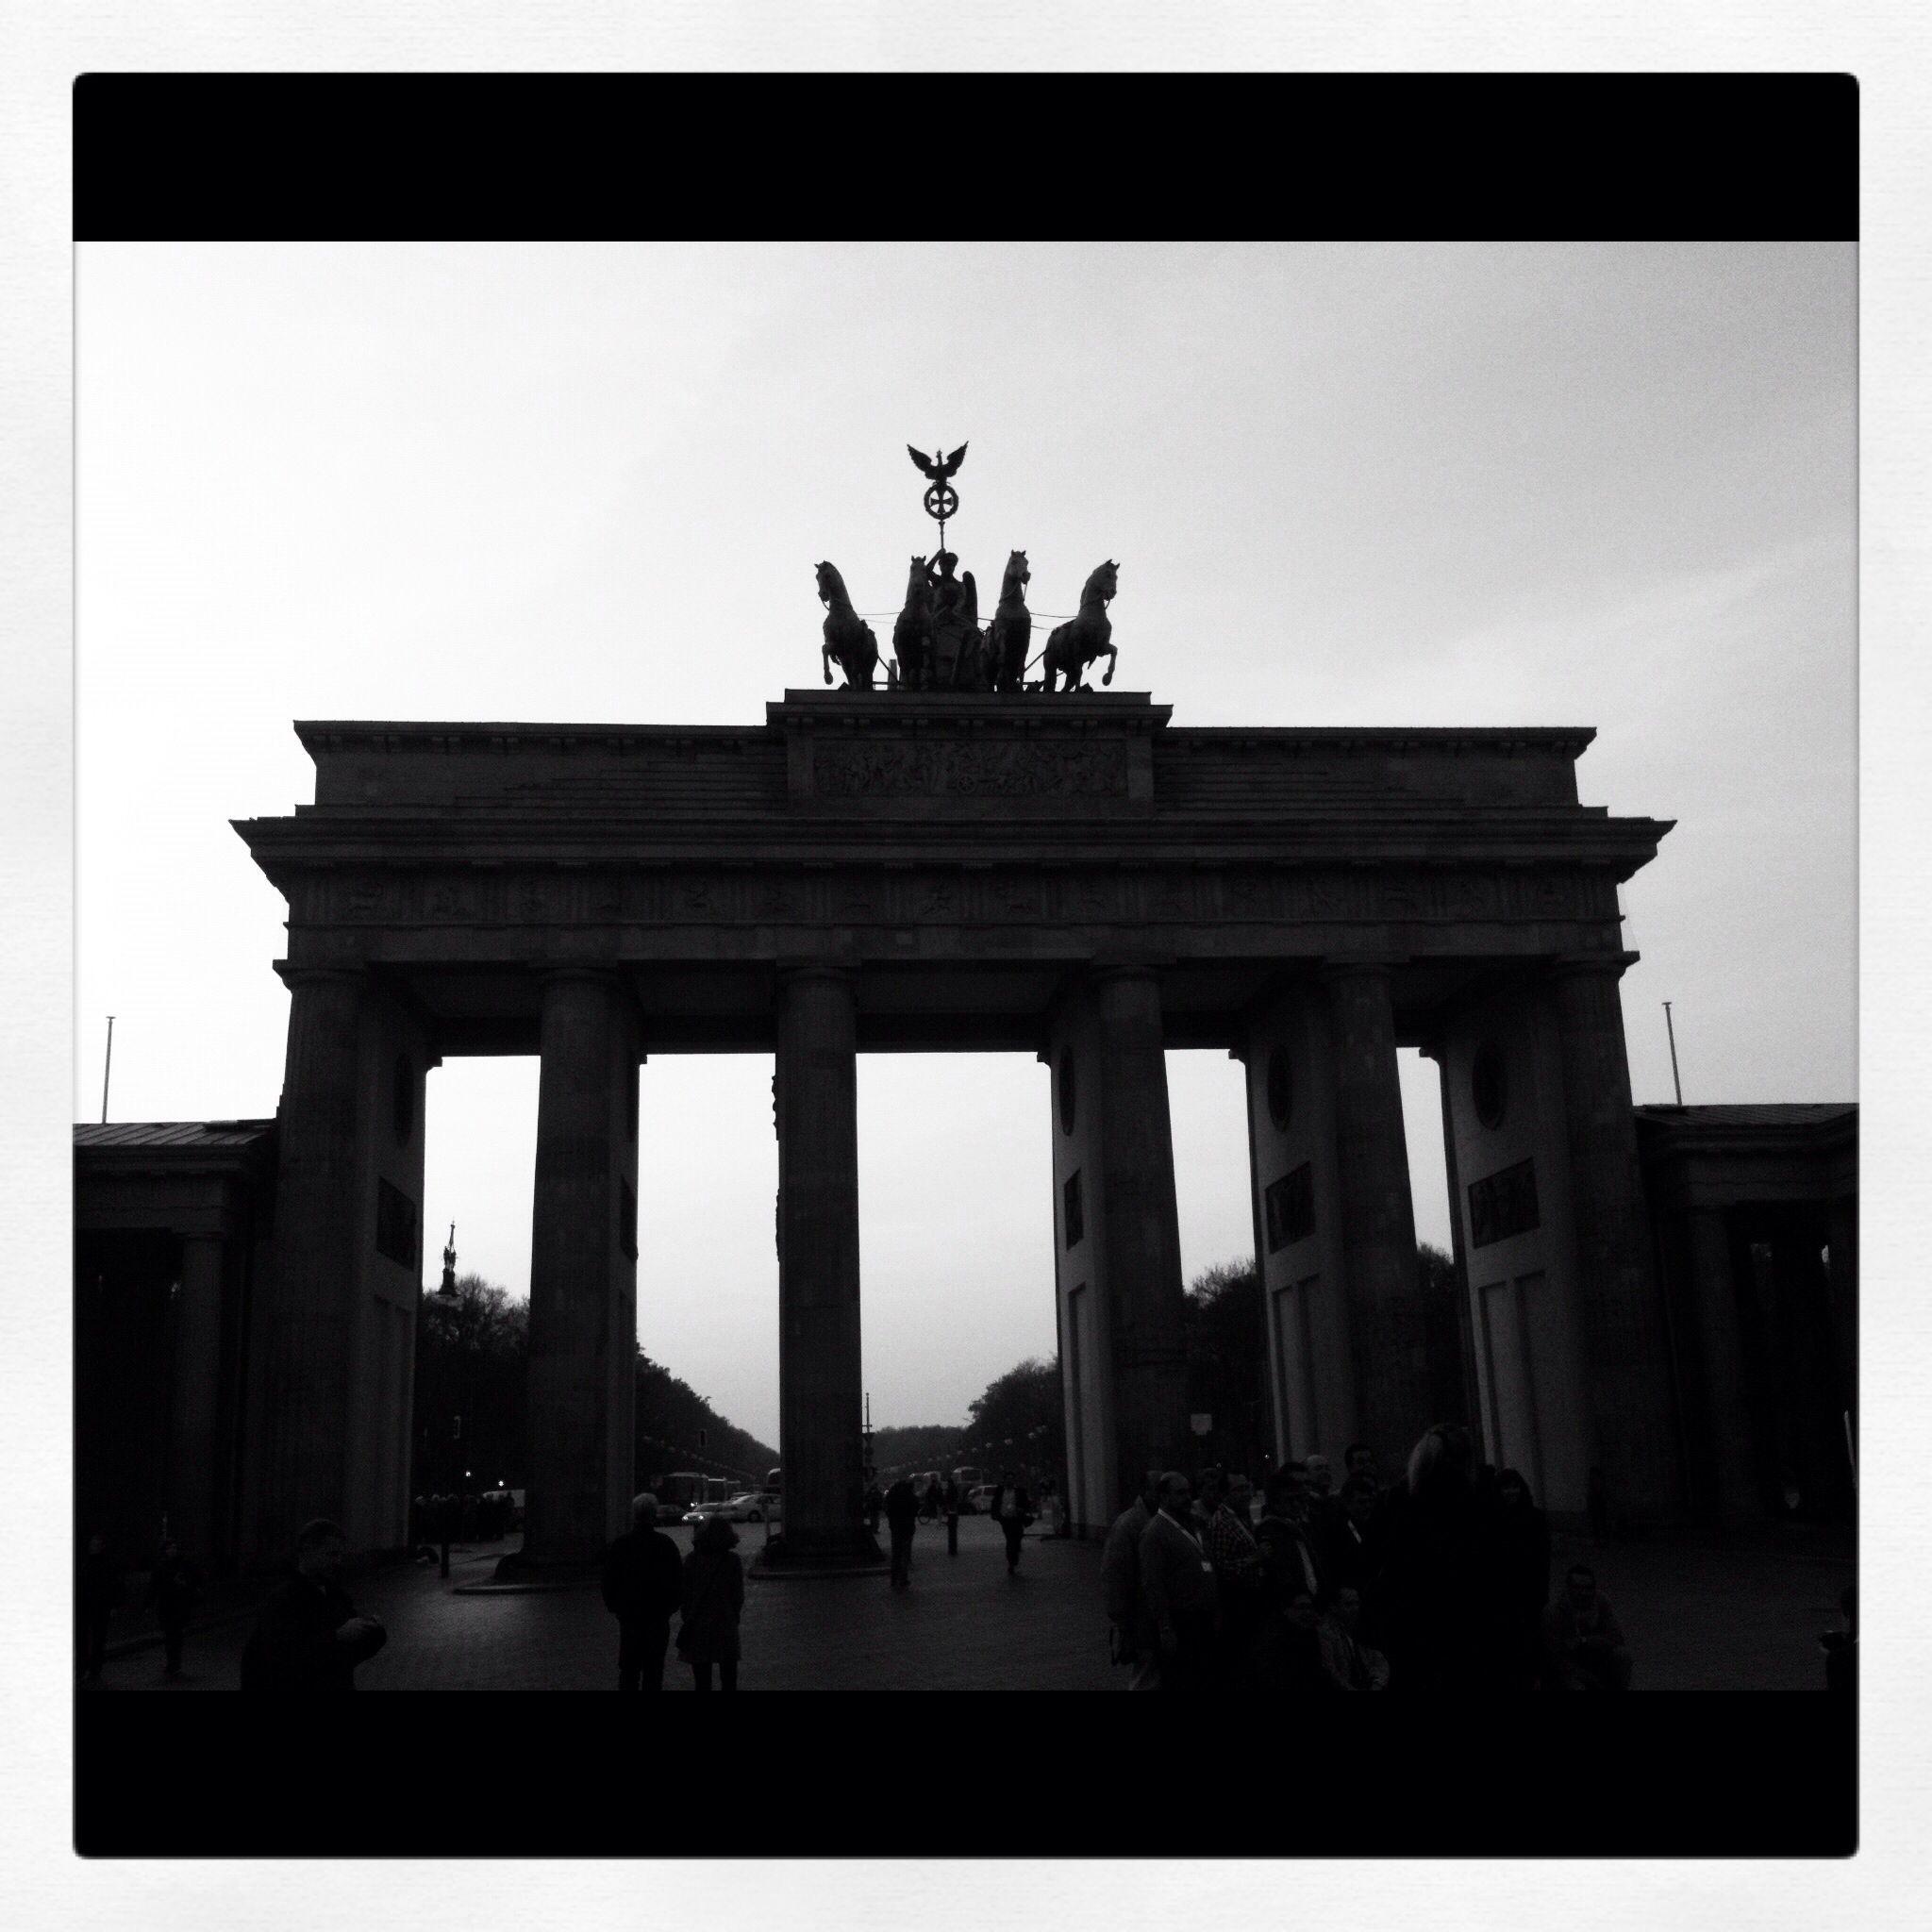 Brandenburger Tor Berlin Brandenburger Tor Berlin Brandenburger Tor Berlin